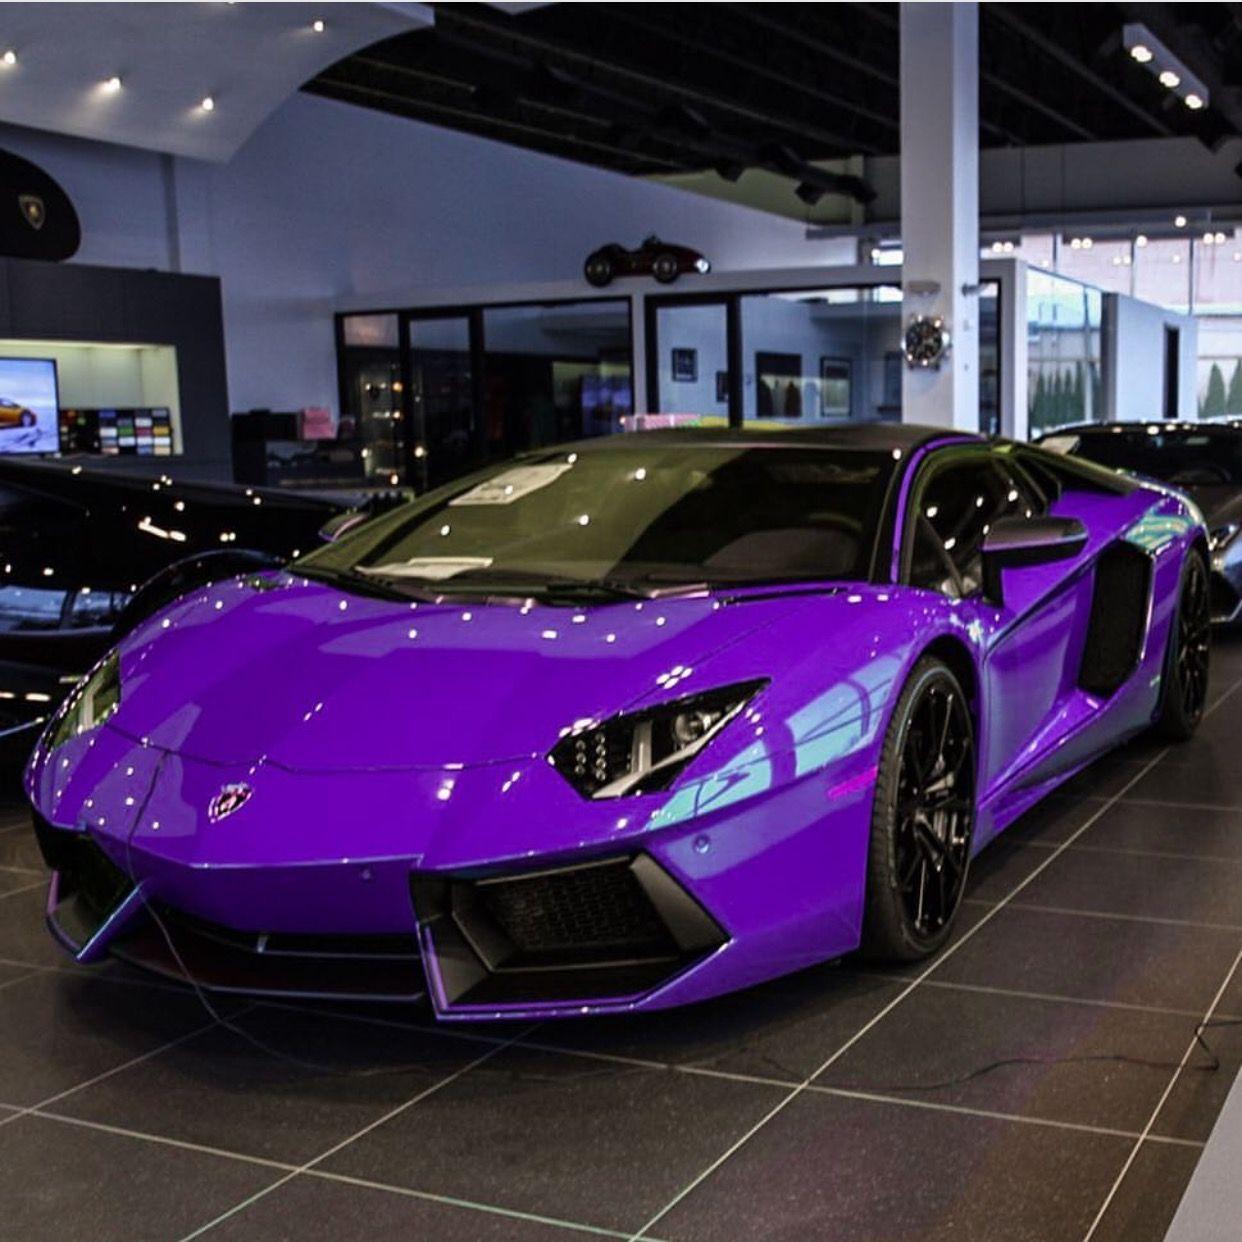 Cars Lamborghini: Lamborghini Aventador Roadster Painted In Royal Purple